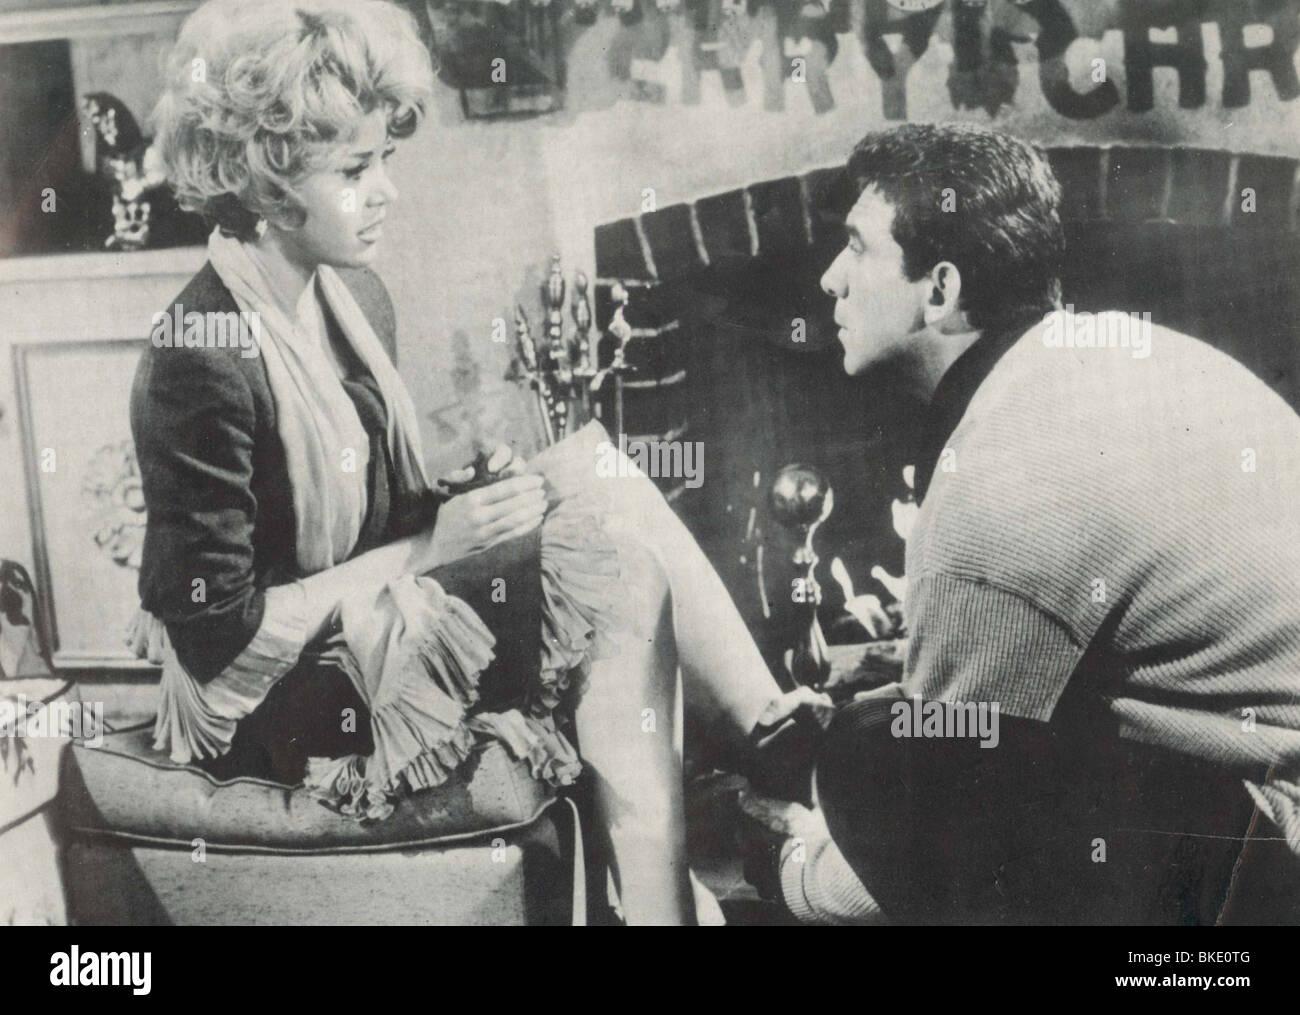 PERIOD OF ADJUSTMENT (1962) JANE FONDA, TONY FRANCIOSA POFA 008FOH - Stock Image